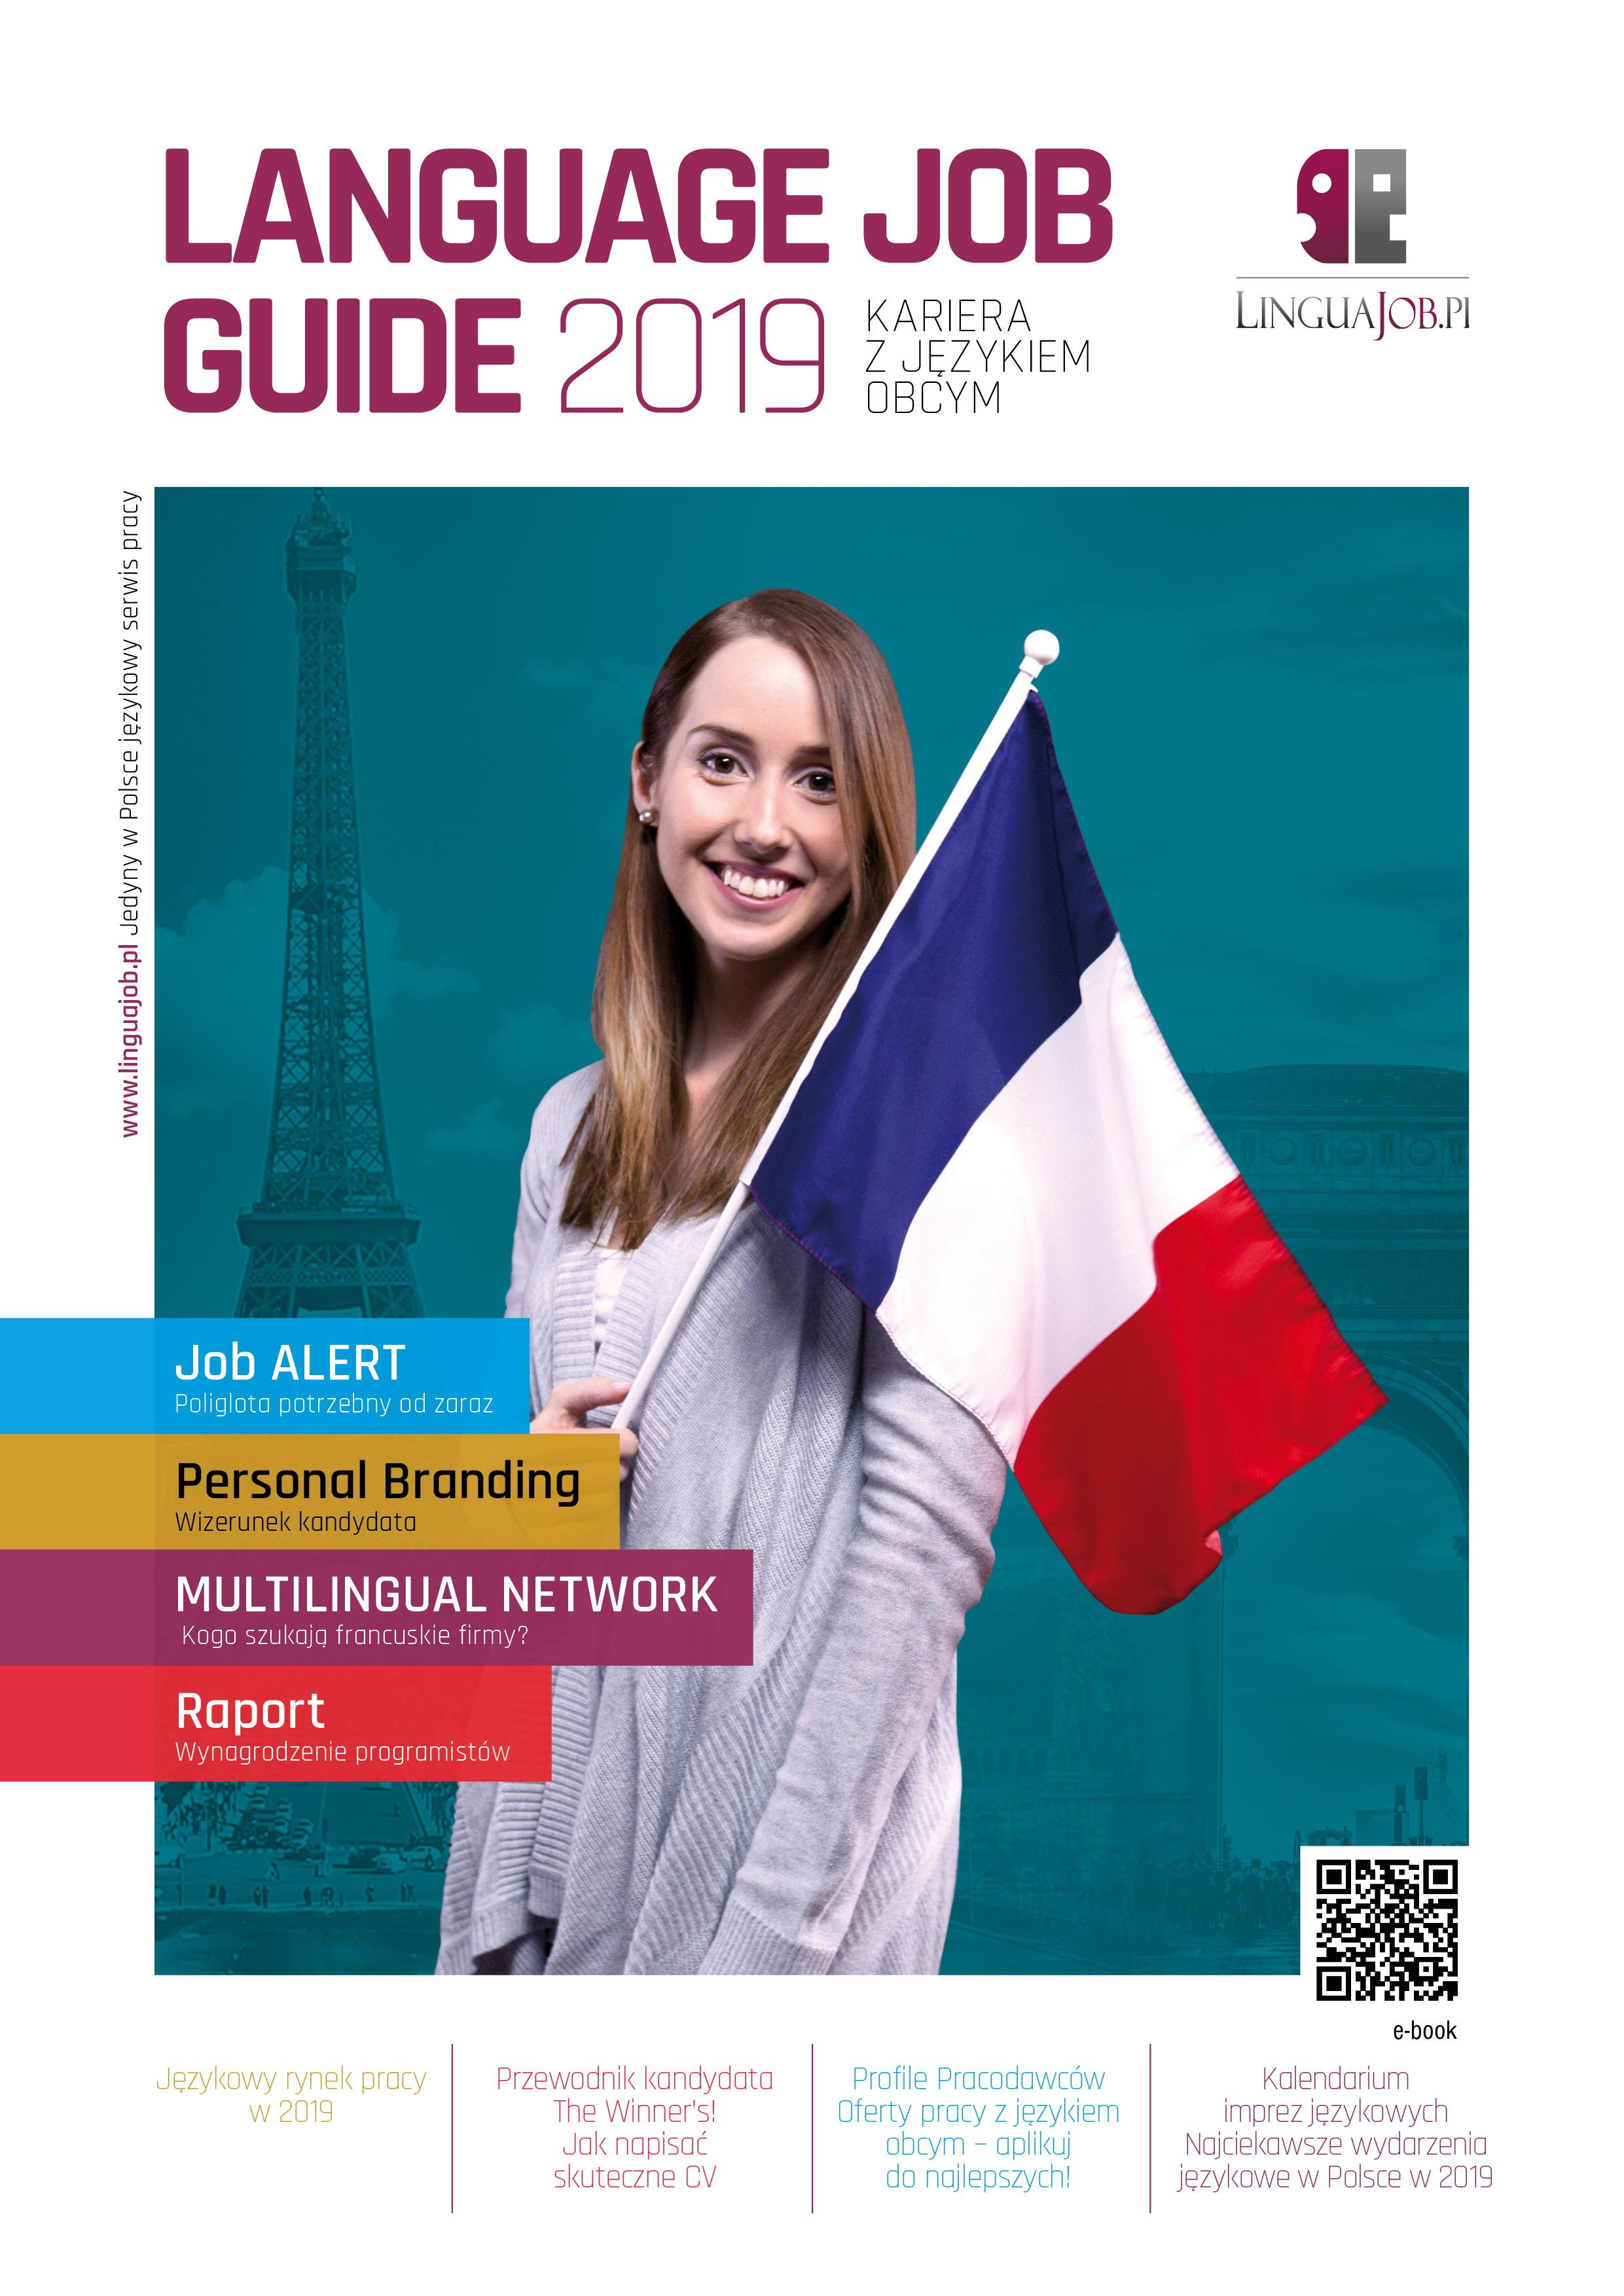 Już jest! Katalog LANGUAGE JOB GUIDE 2019!